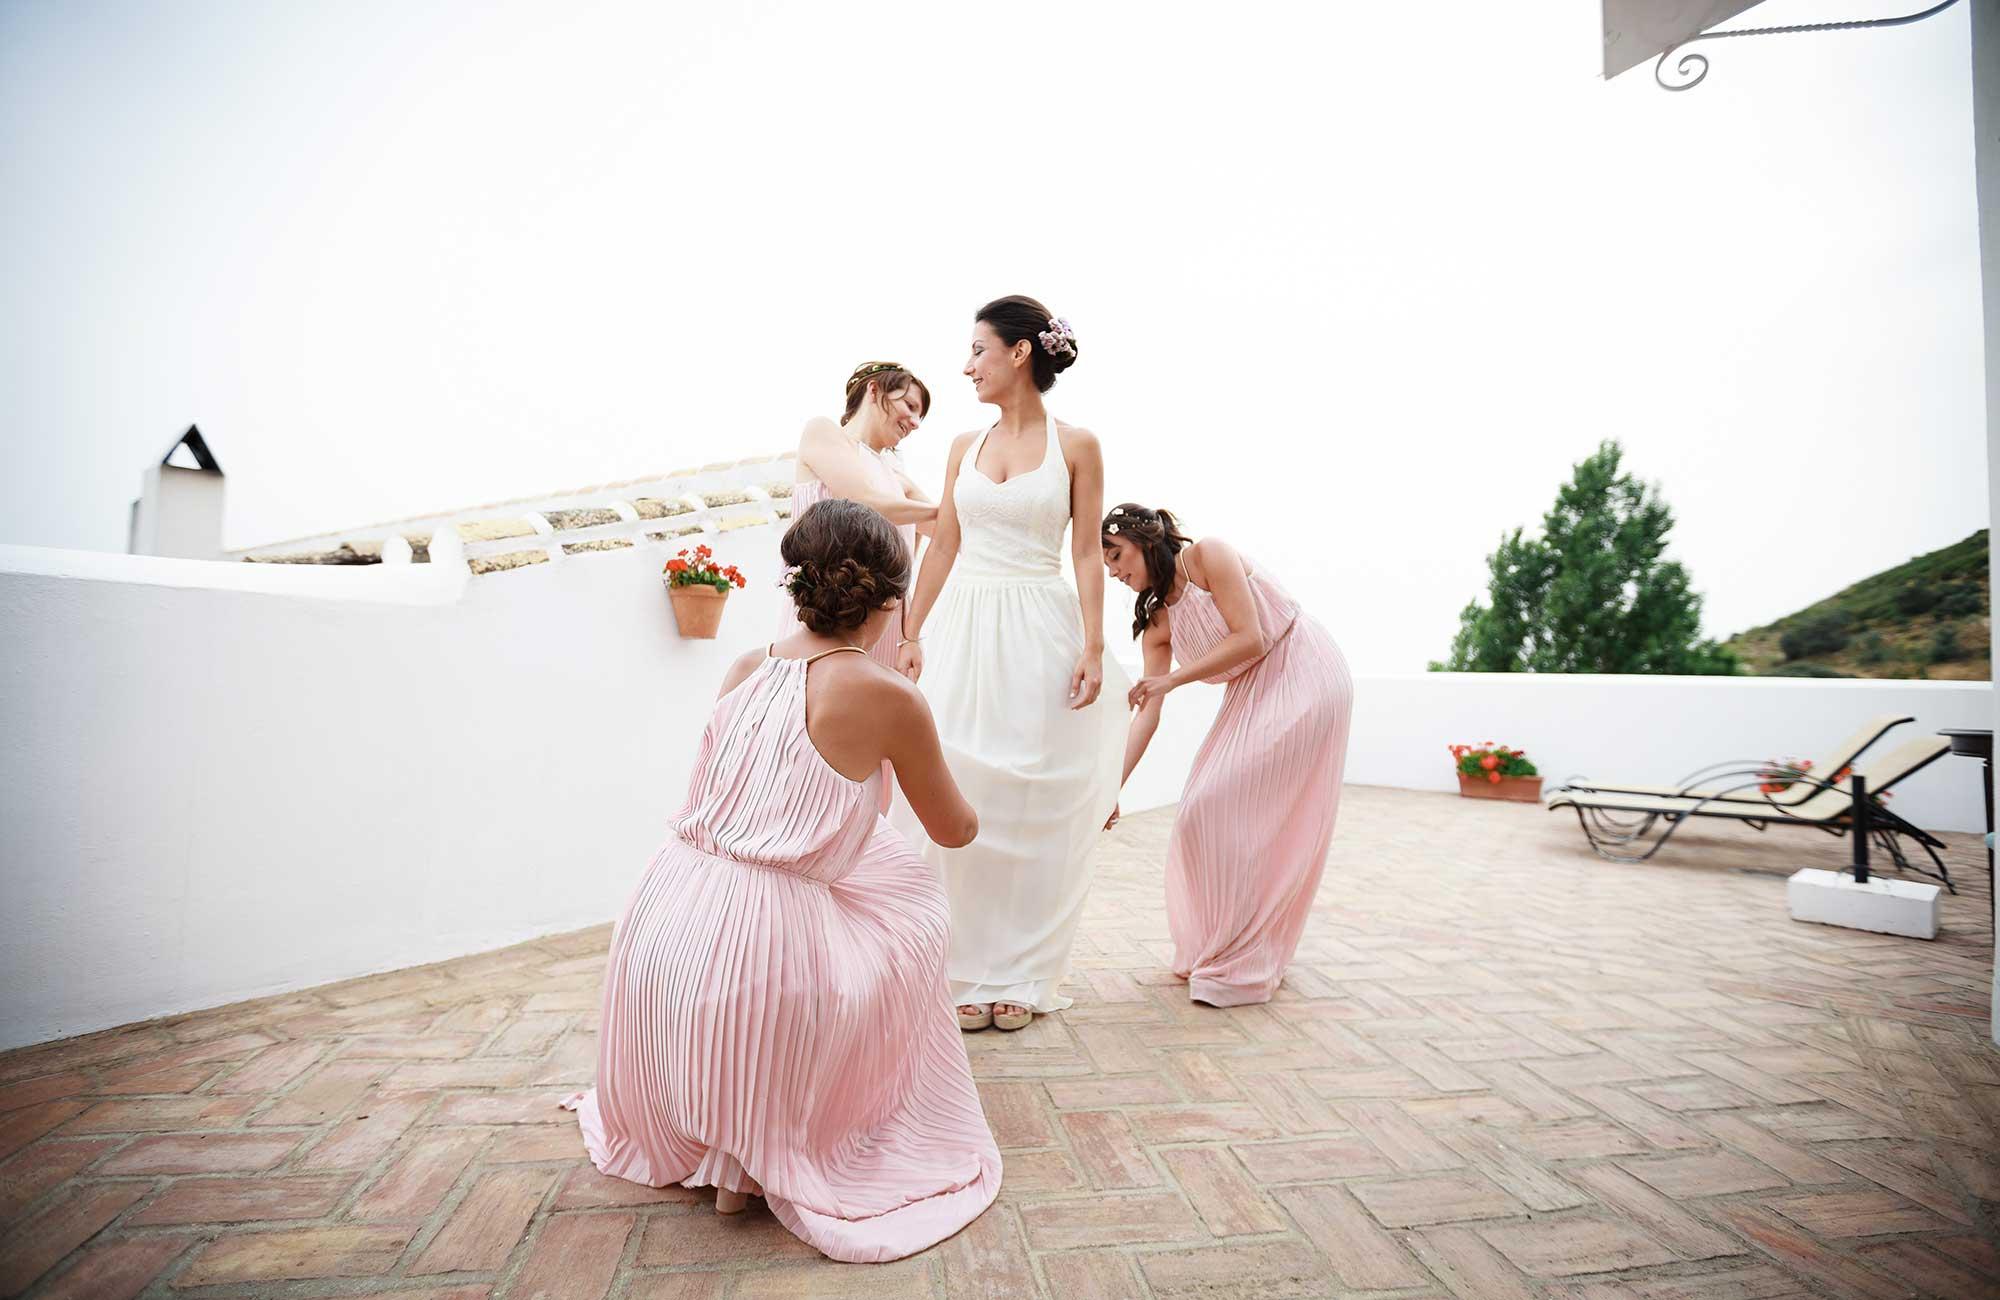 0003 Fotografo bodas Malaga - Juan Justo